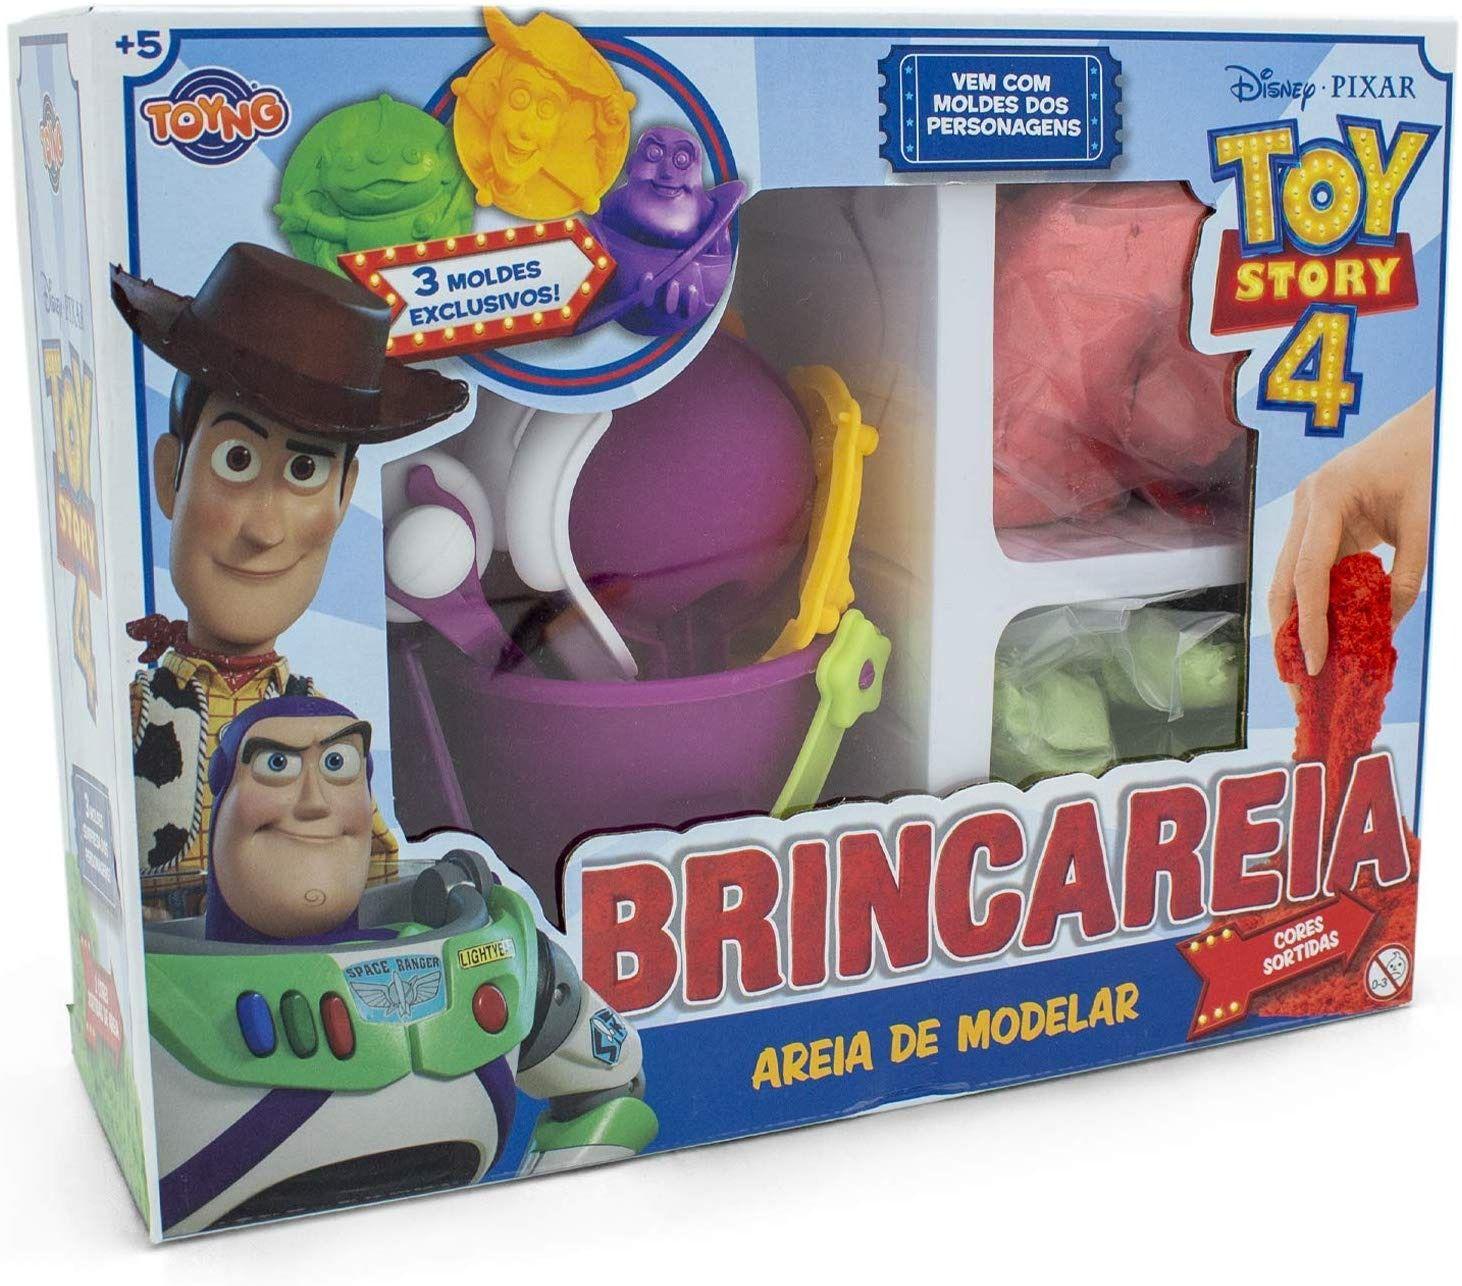 Conjunto Areia de Modelar - Toy Story 4 - Toyng